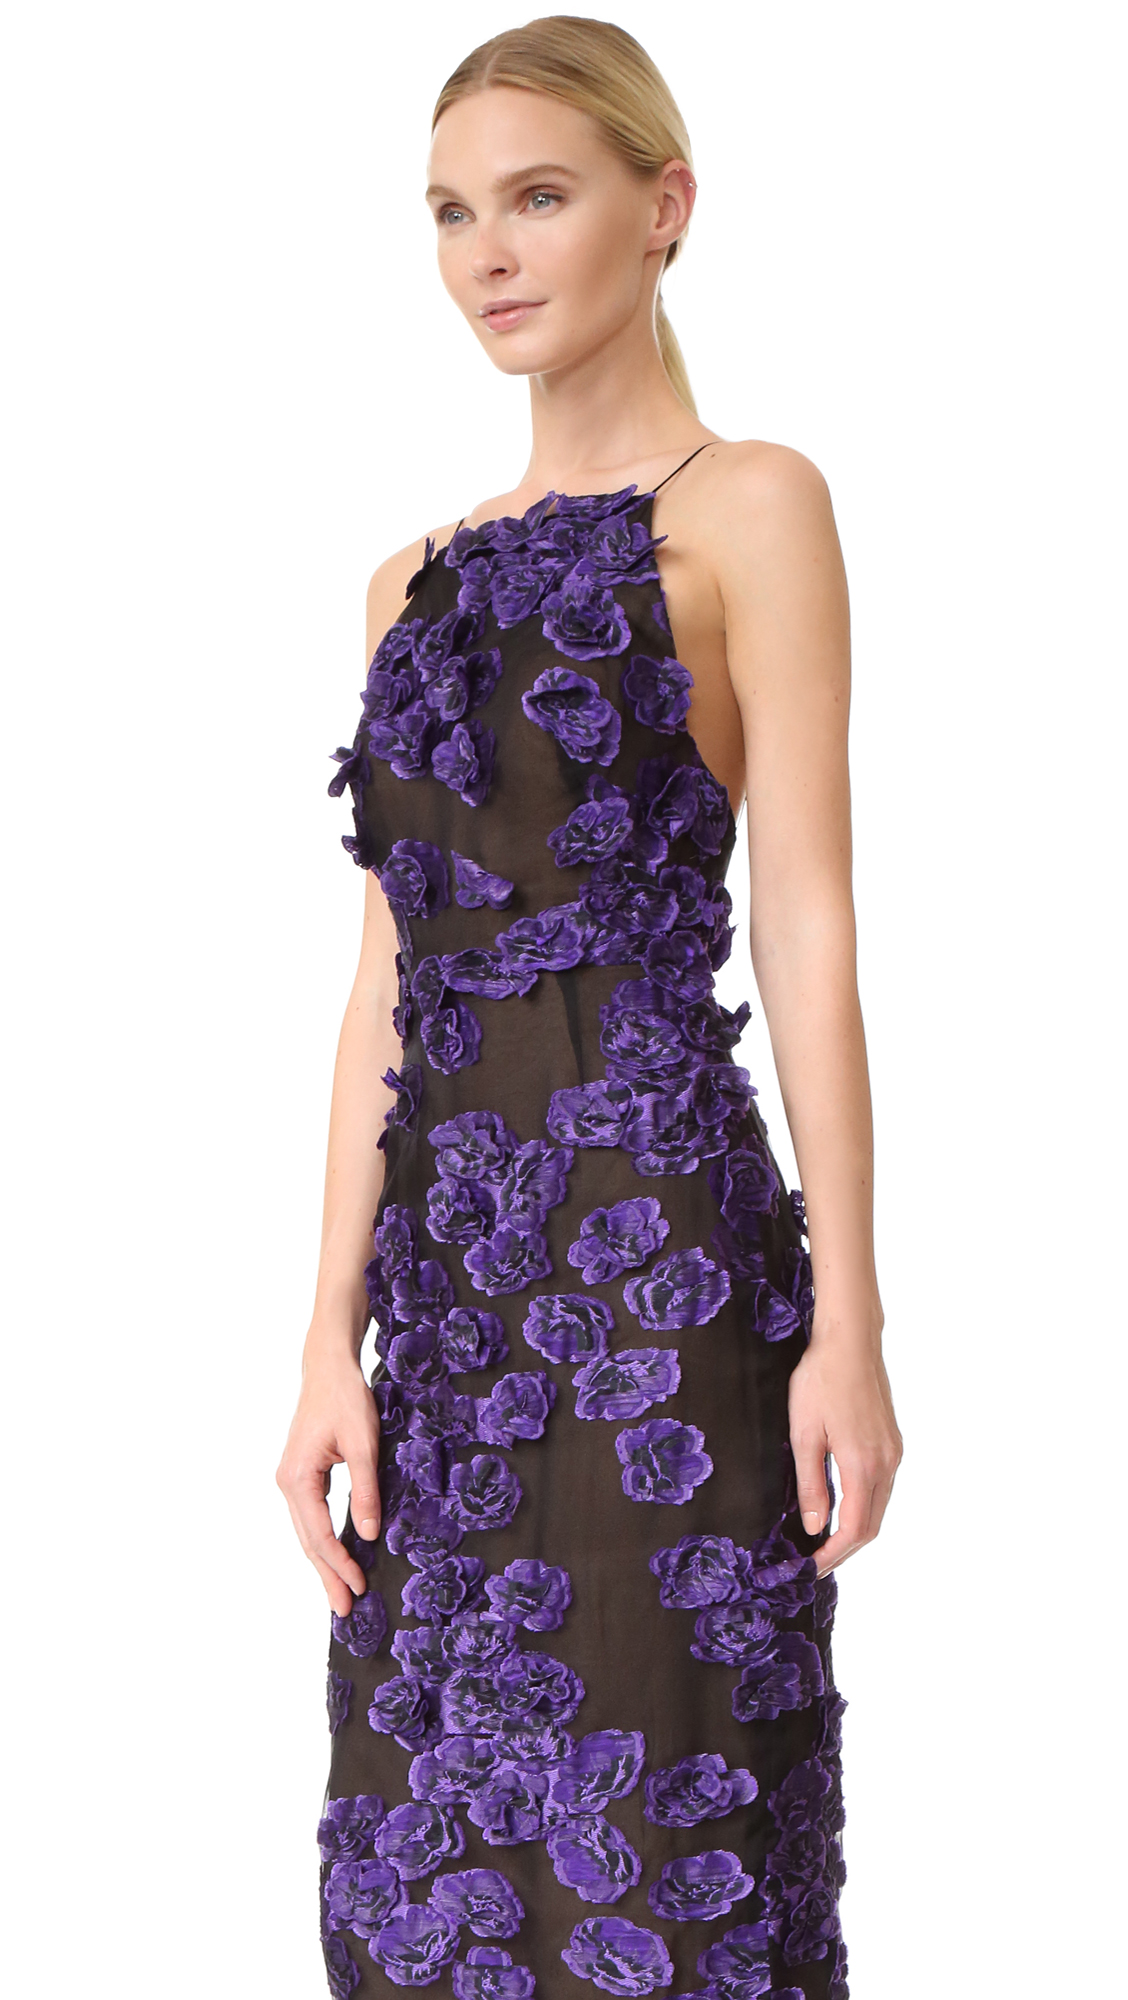 Jason Wu Floral Sleeveless Fil Coupe Dress | SHOPBOP